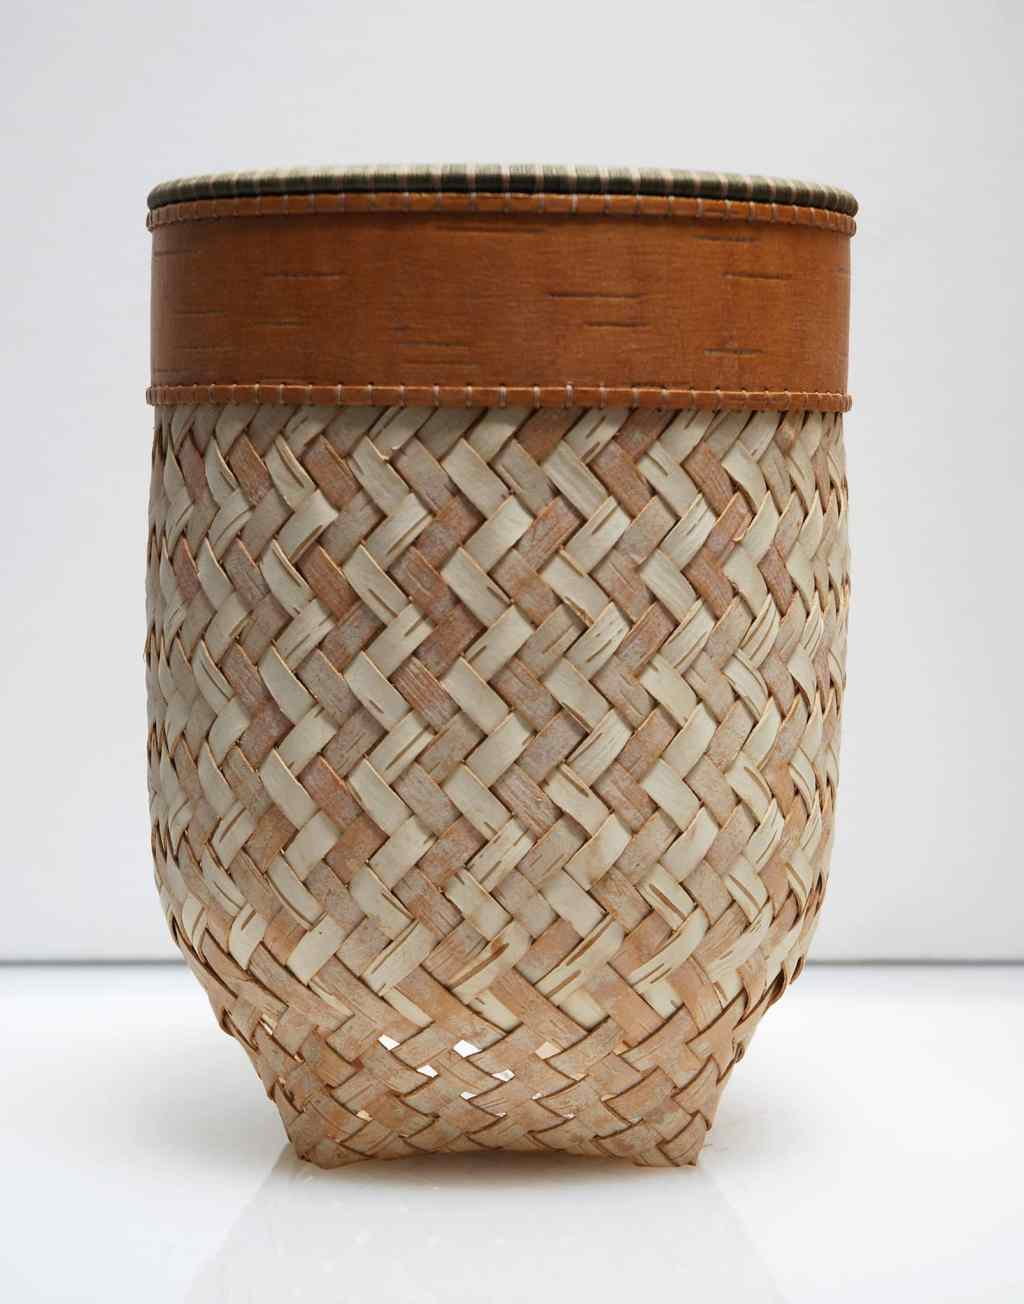 Dona Look, Basket, 2003